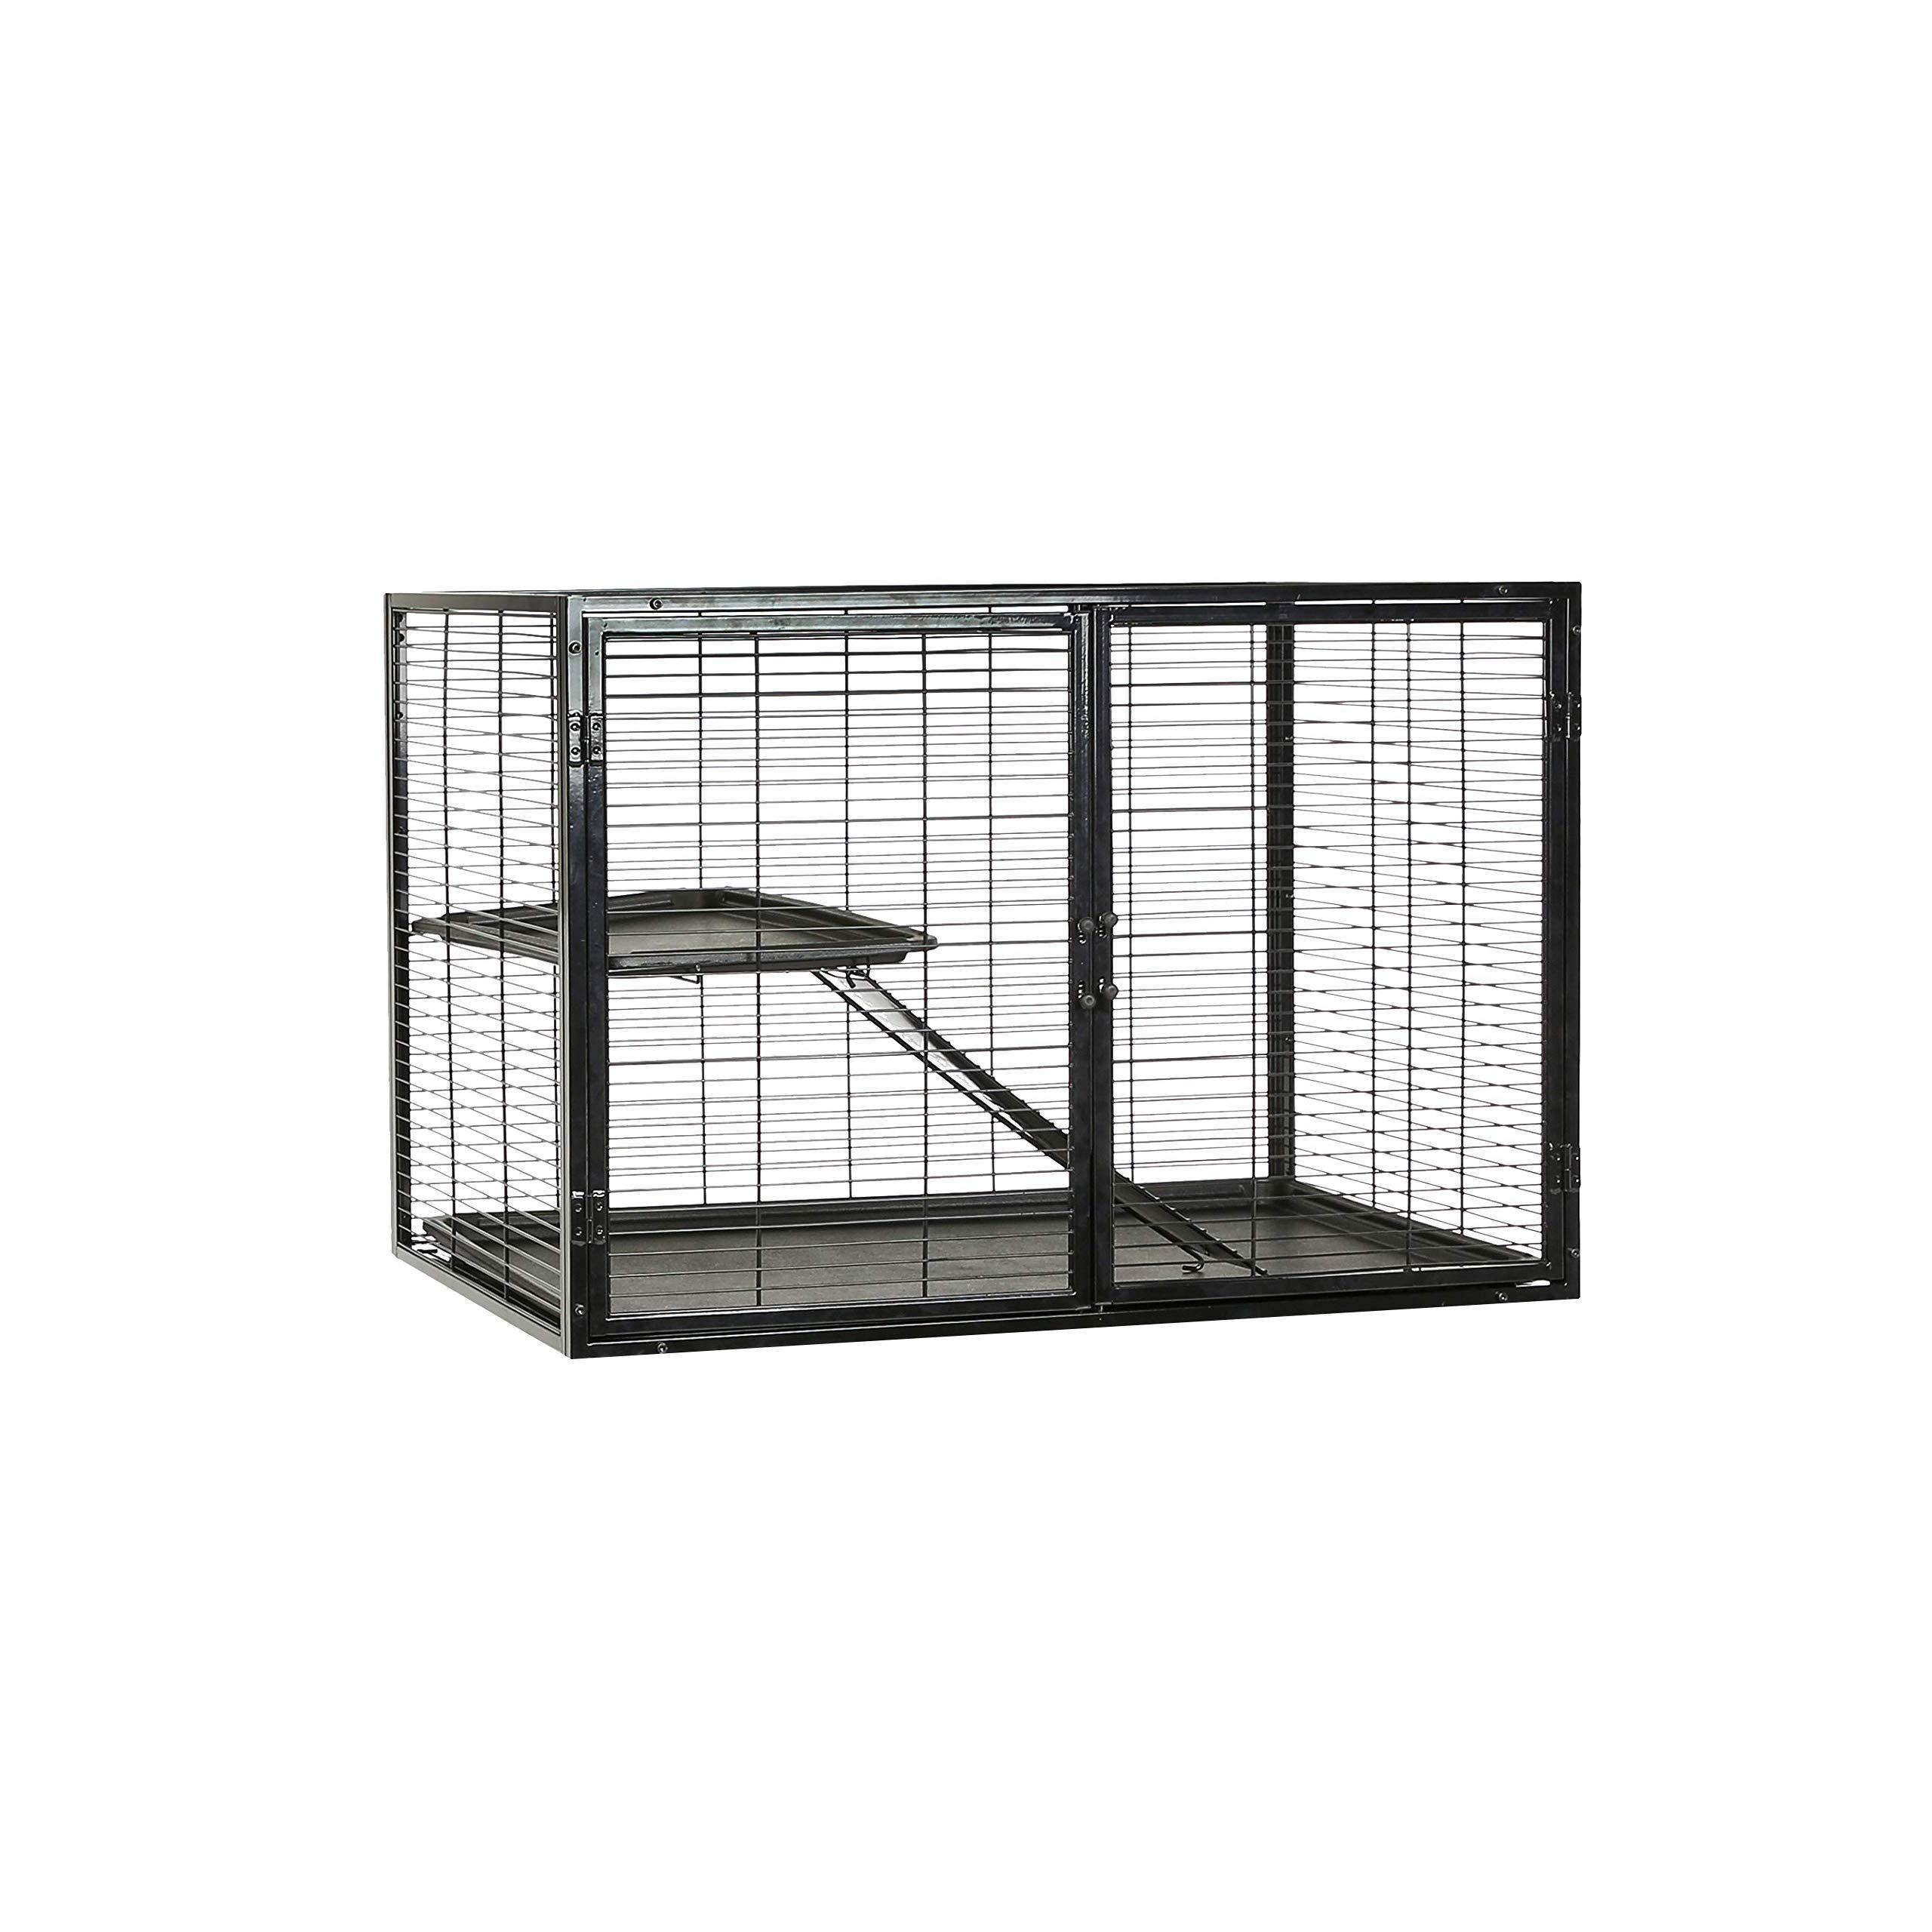 AmazonBasics Small Animal Metal Pet Cage Add On - 36 x 25 x 23 Inches by AmazonBasics